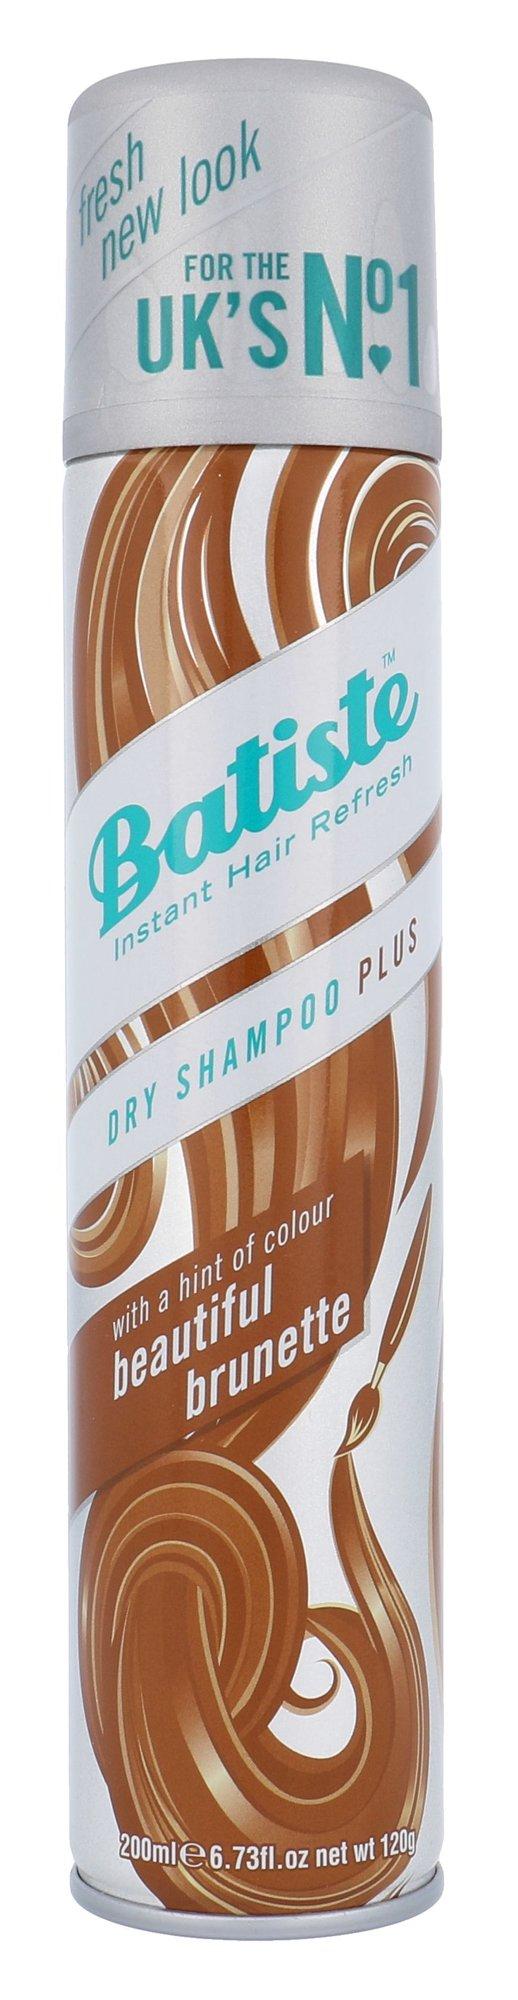 Batiste Beautiful Brunette Cosmetic 200ml